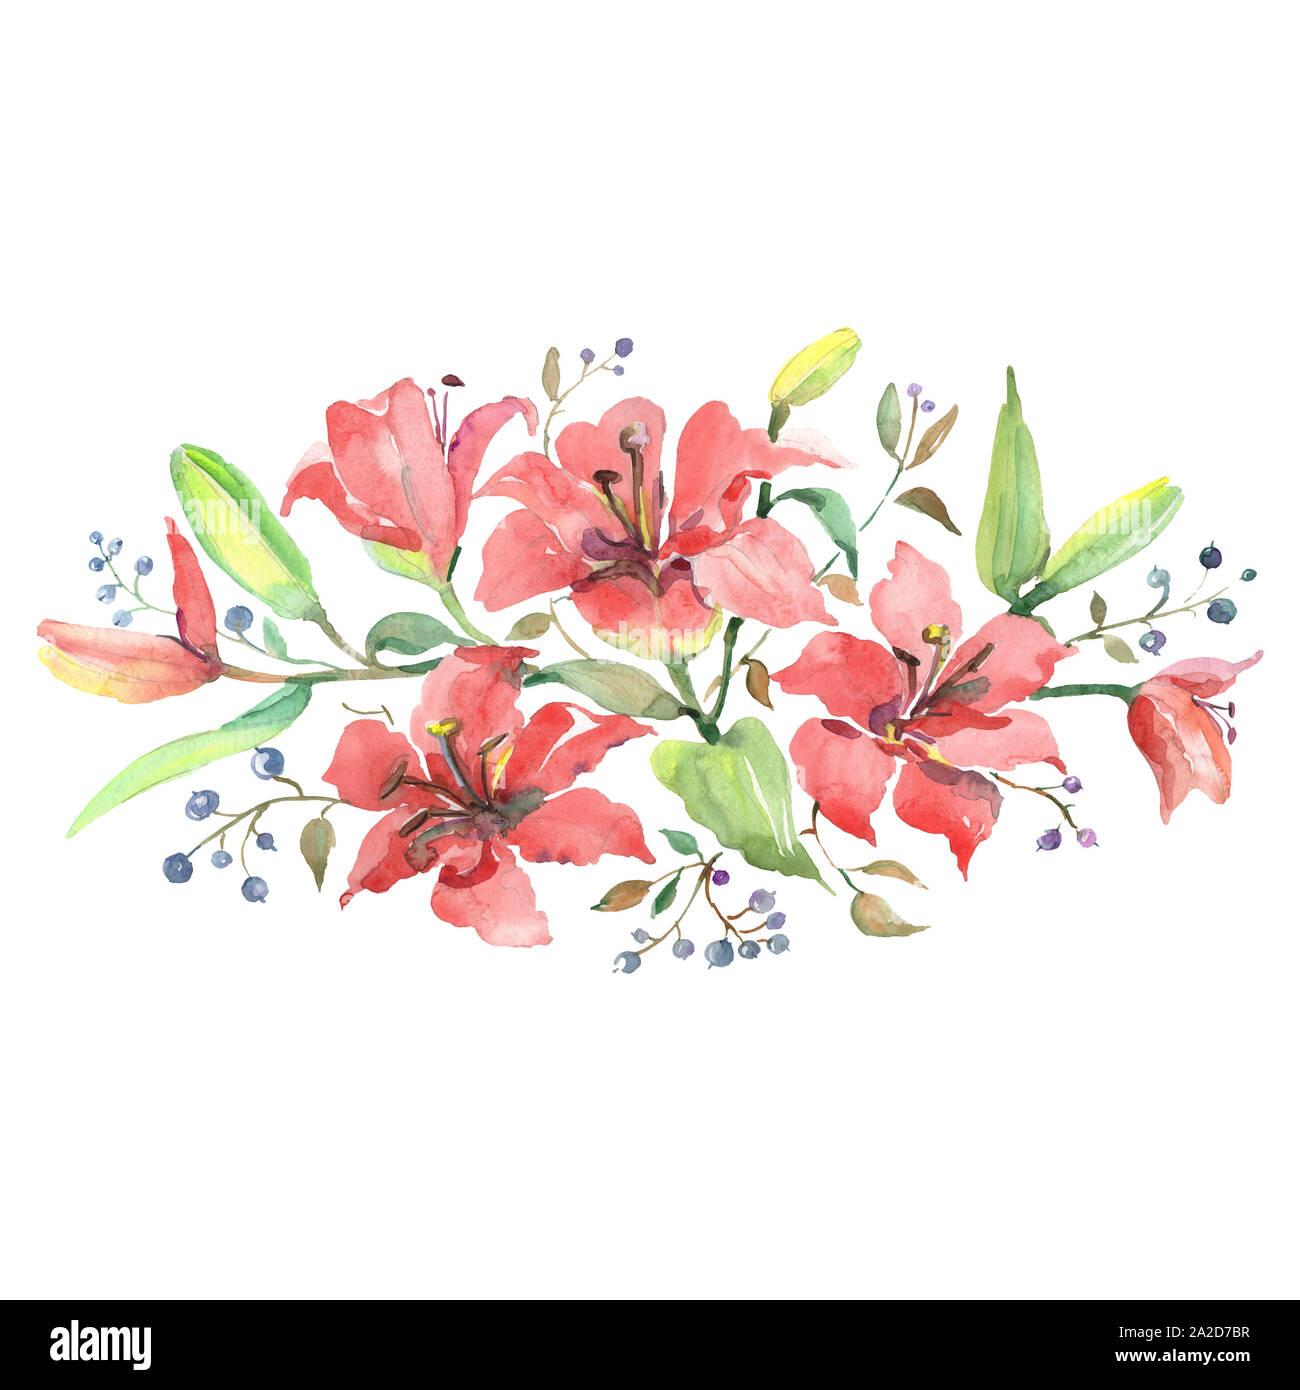 Orange lilies bouquet floral botanical flowers. Watercolor background set. Isolated bouquets illustration element. Stock Photo